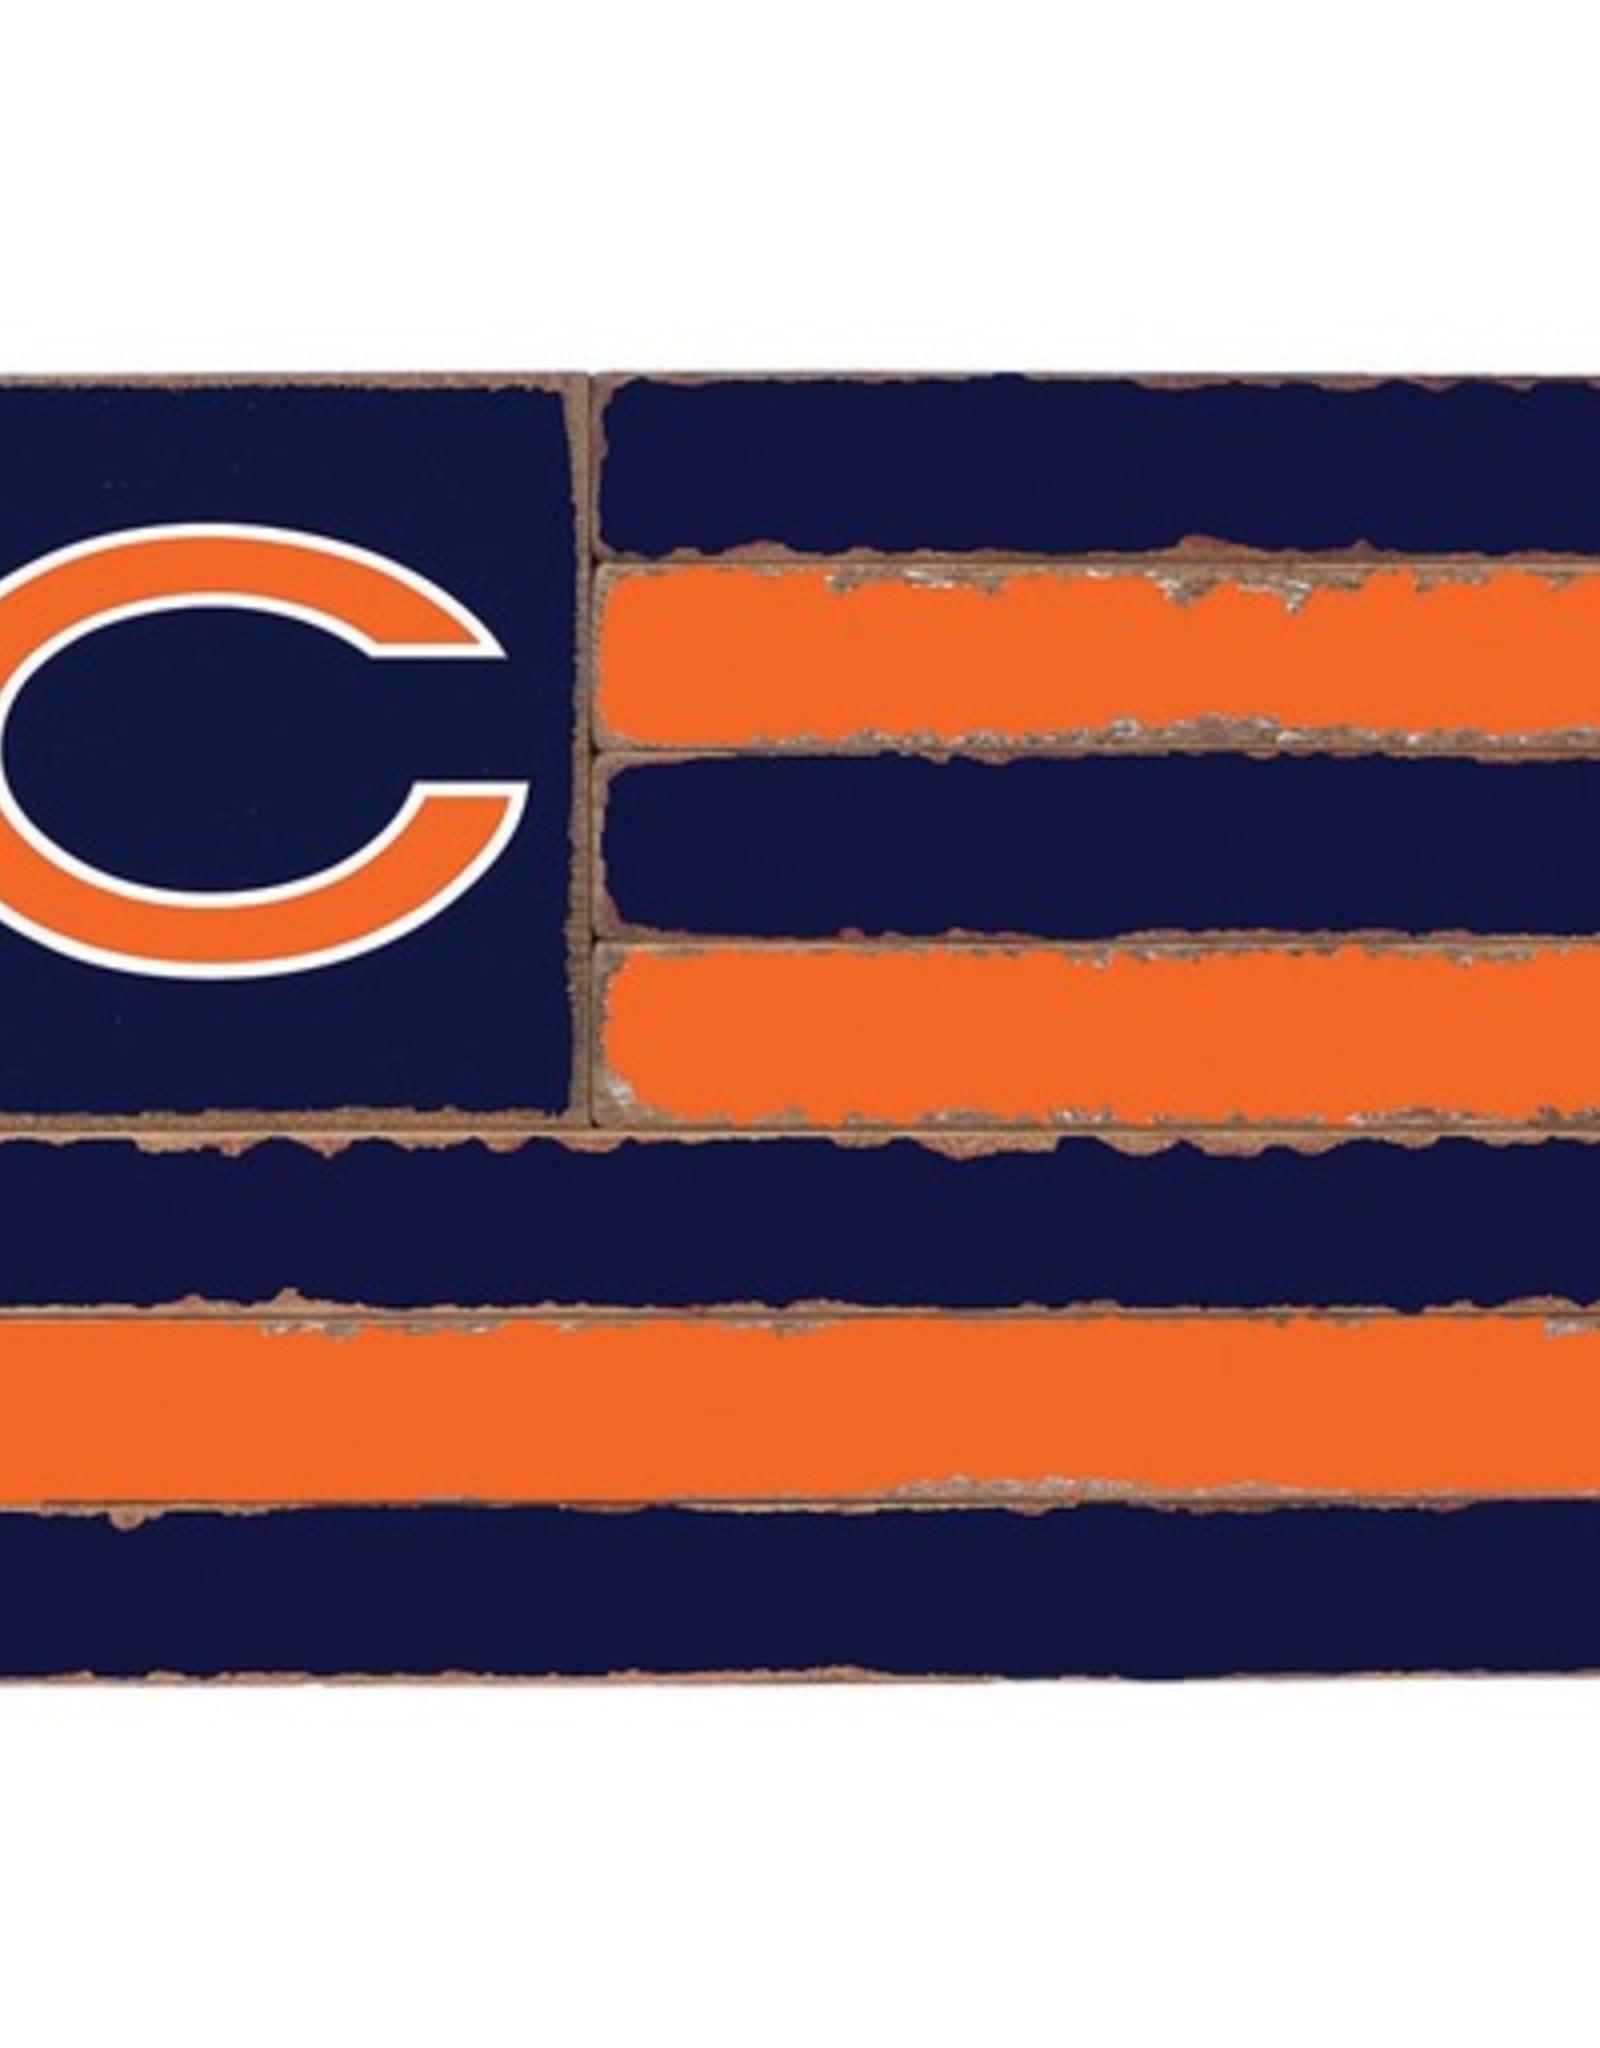 RUSTIC MARLIN Chicago Bears Rustic Team Flag